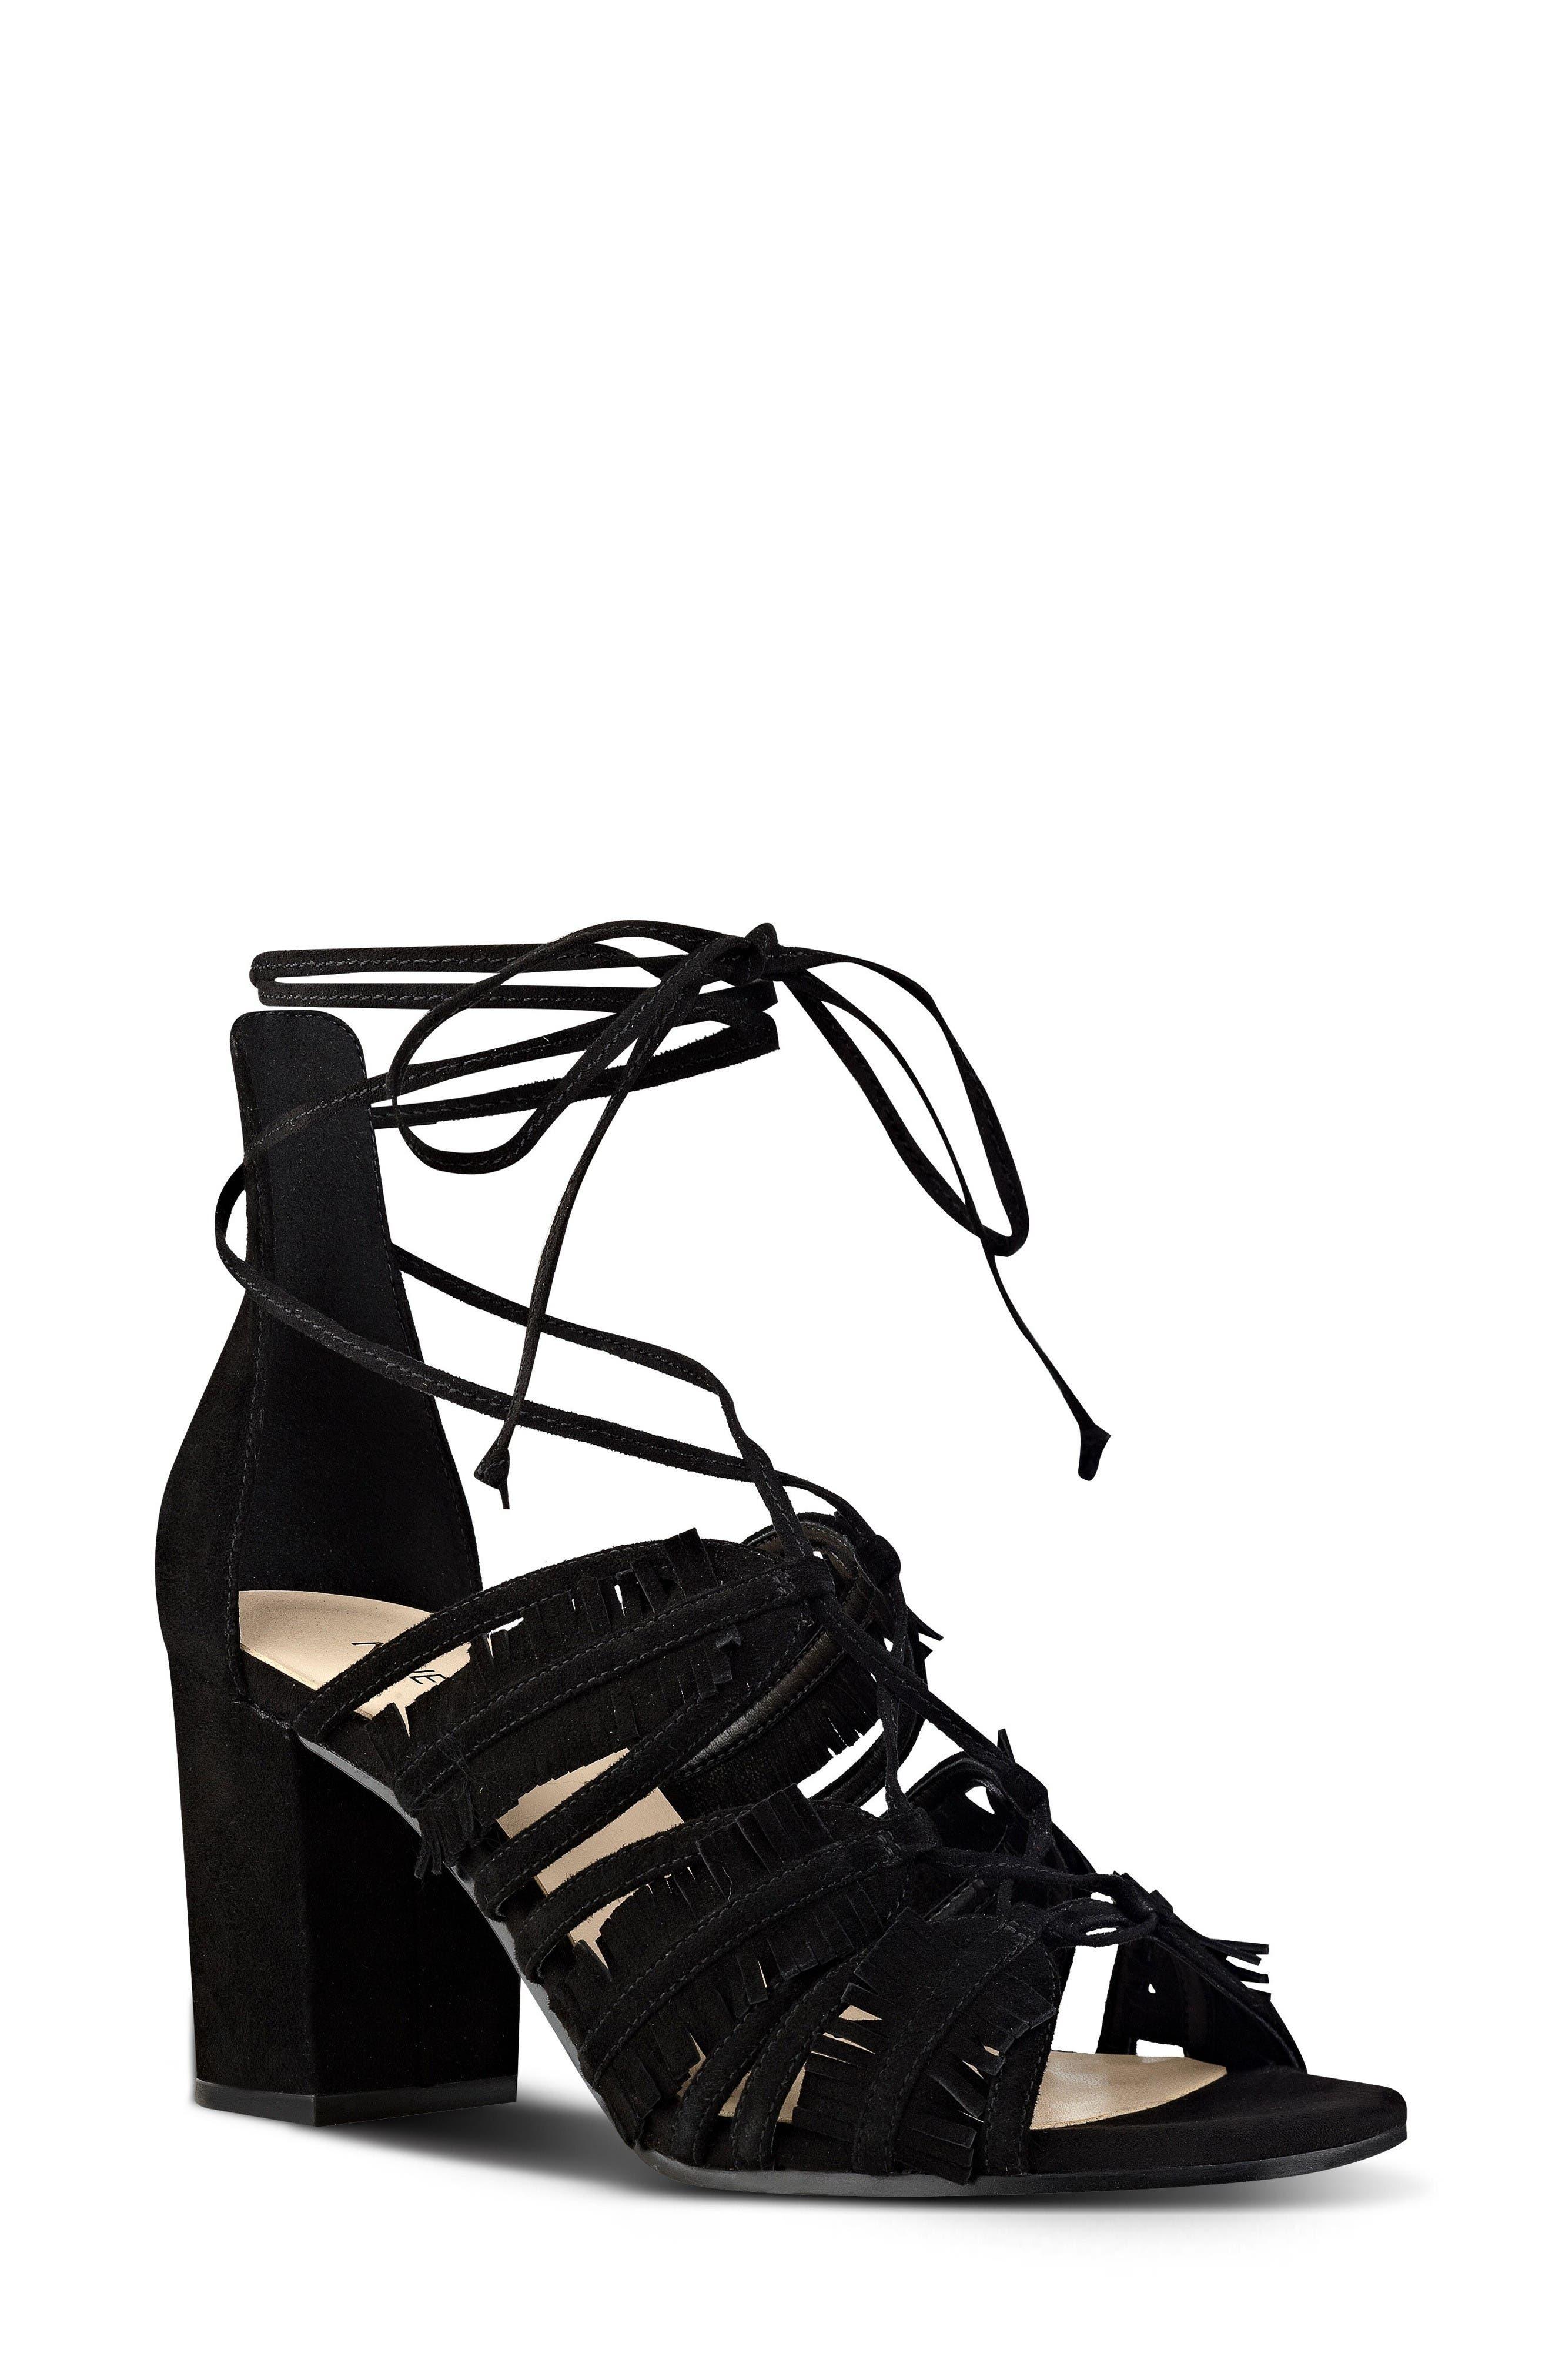 Main Image - Nine West Genie Lace-Up Sandal (Women)